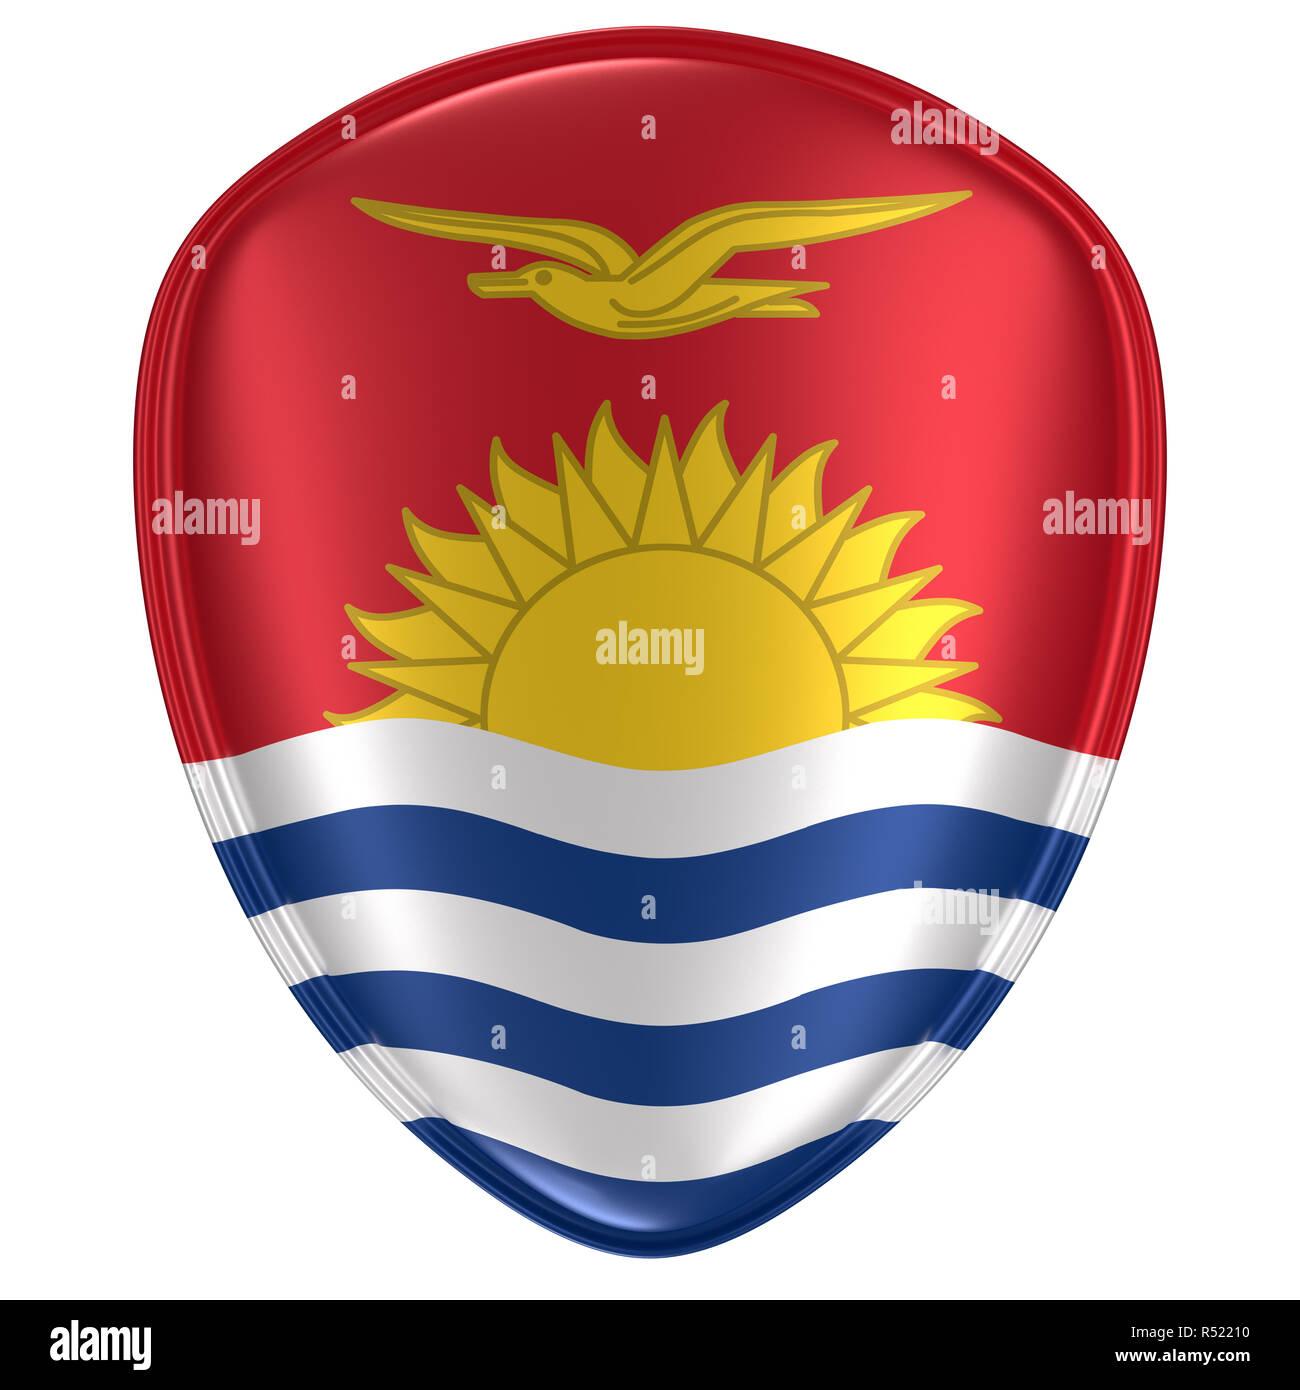 3d rendering of a Kiribati flag icon on white background. - Stock Image